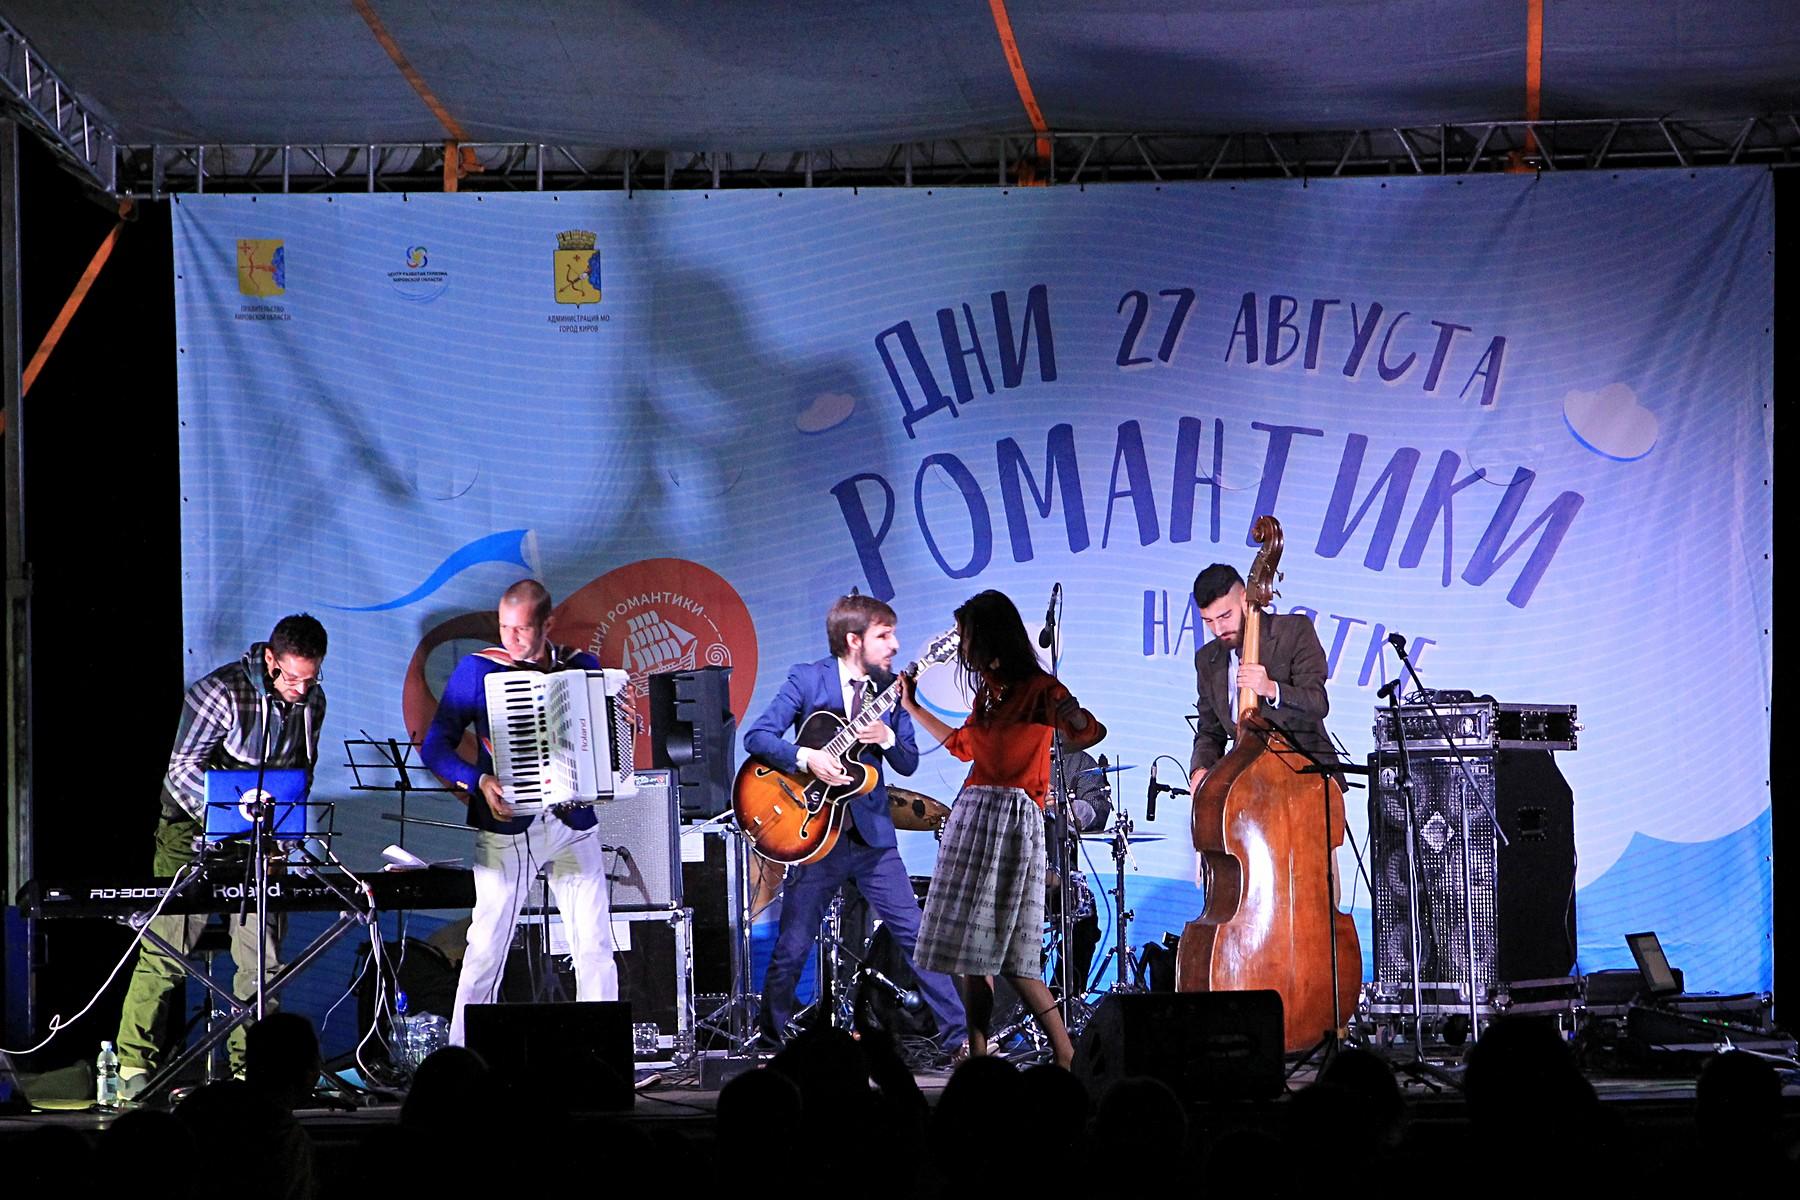 Джазовый концерт в Дни романтики на Вятке